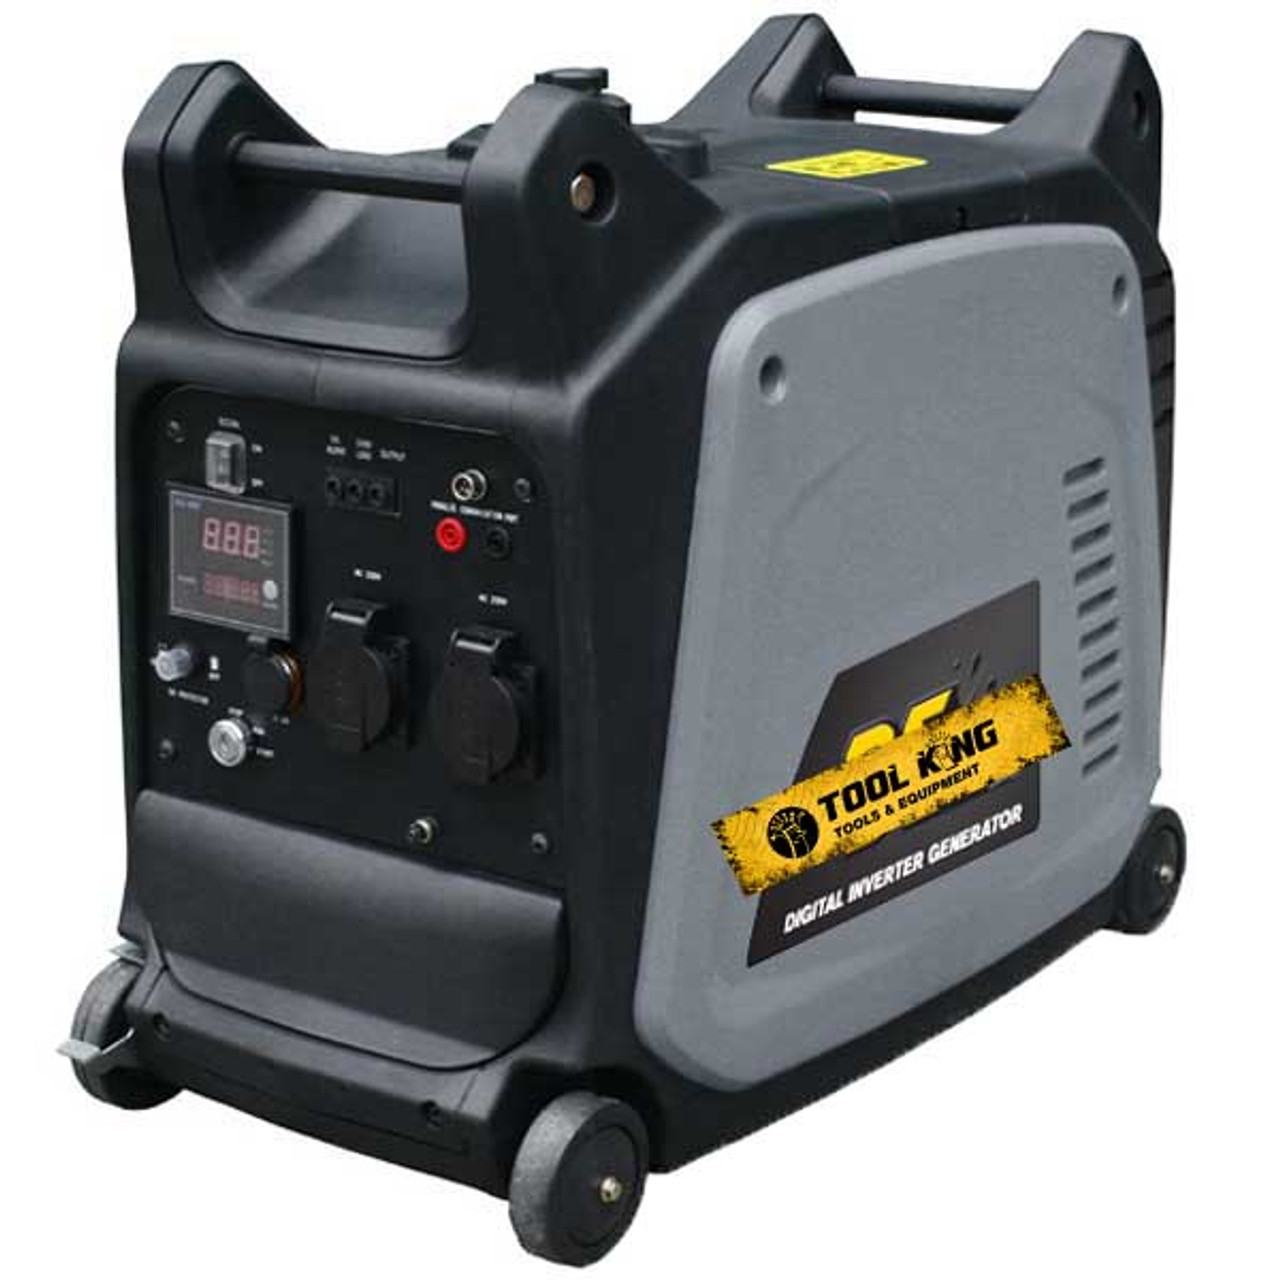 Invertor Generator BE 2600watt